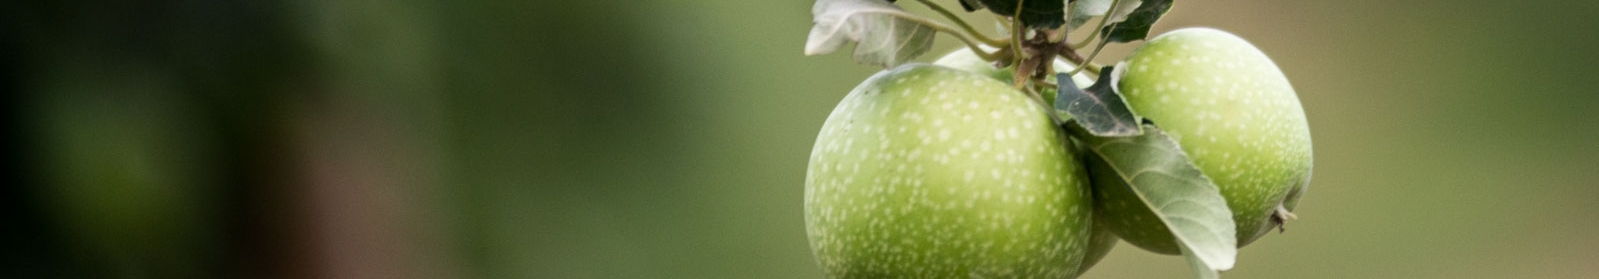 apple_header